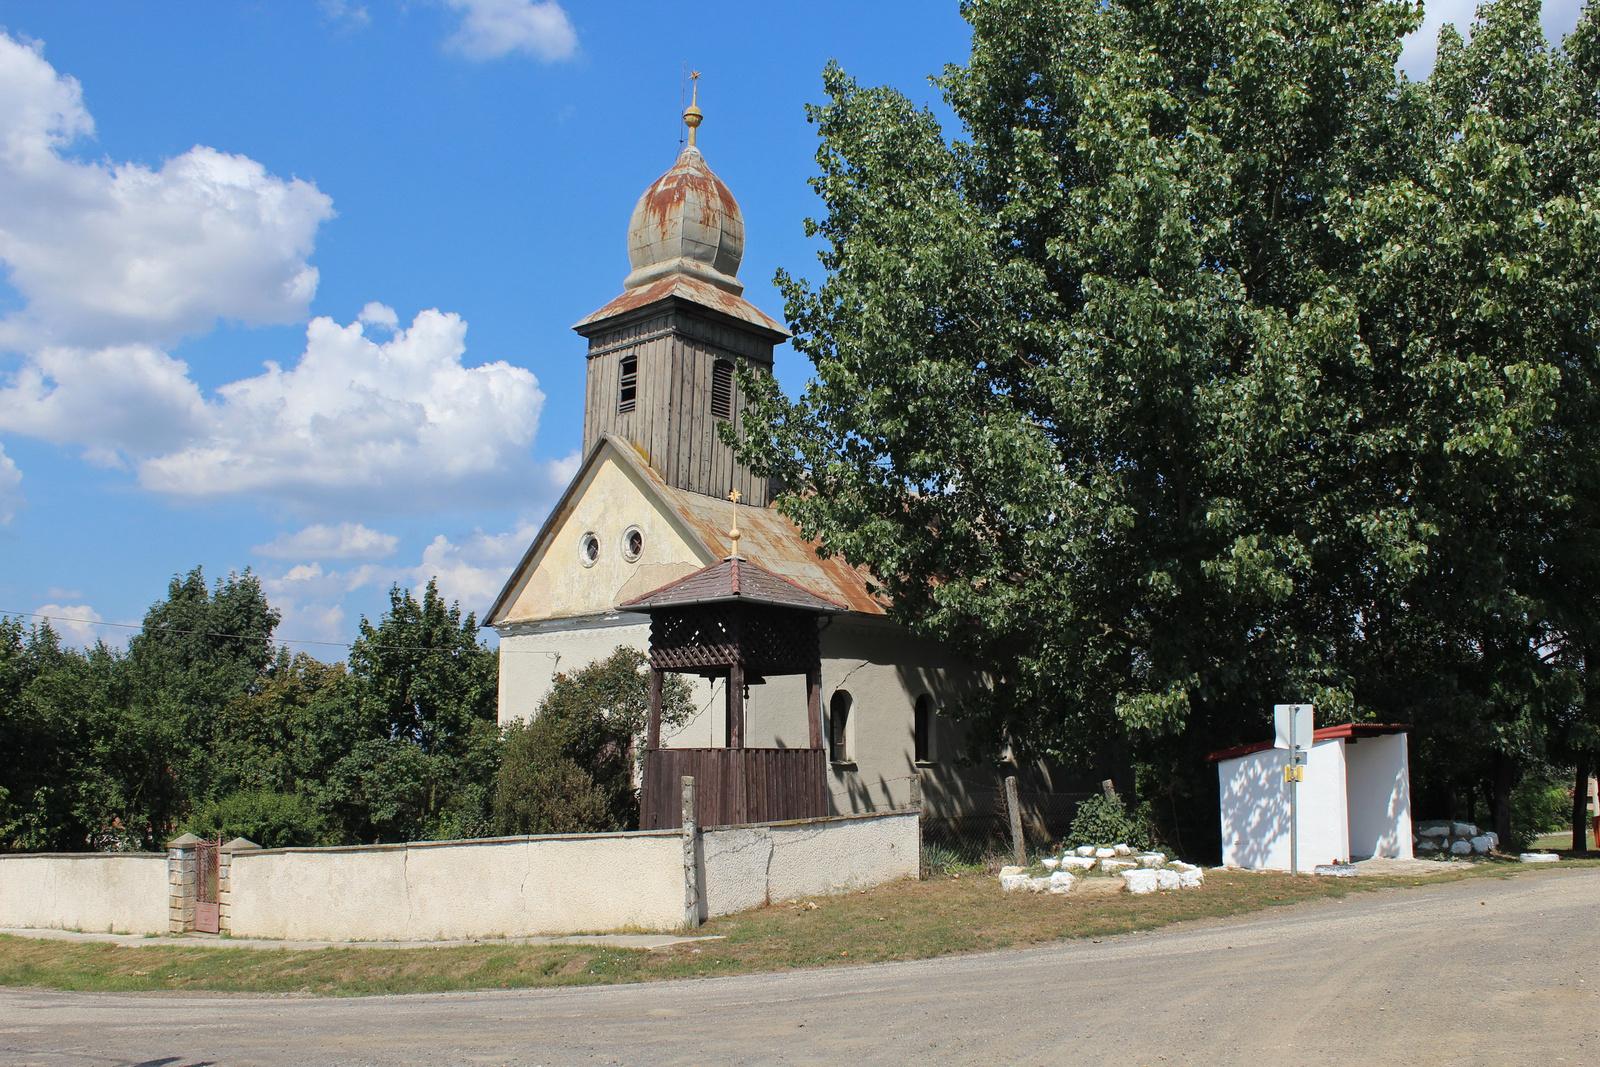 20180819-34-Hernadcece-Templom